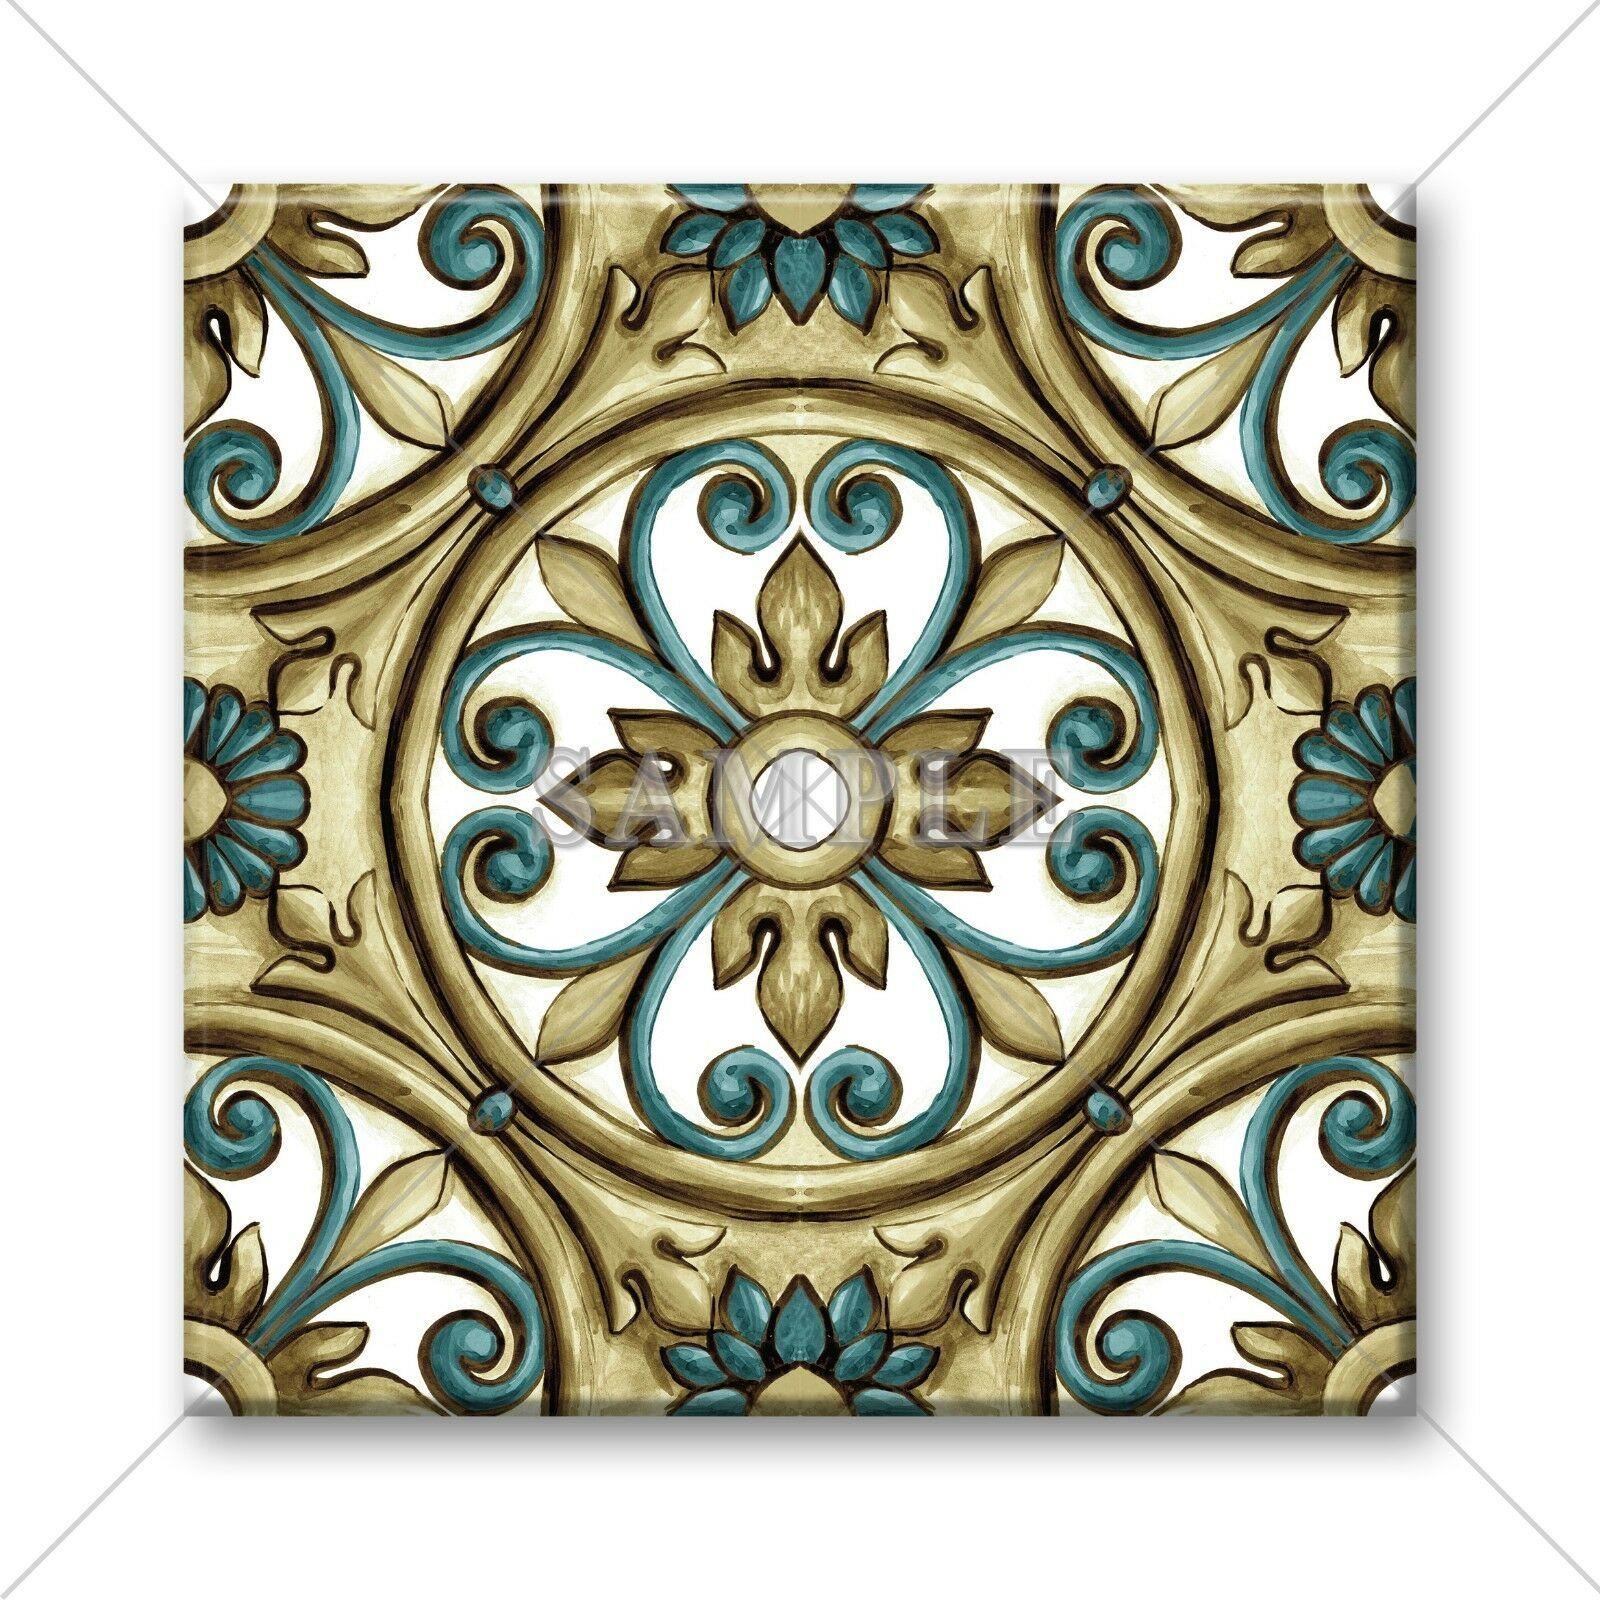 Patterned Ceramic Tiles Decorative Ceramic Tiles Backsplash Wall Tiles 47 Ebay Decorative Wall Tiles Ceramic Tile Backsplash Decorative Ceramic Tile